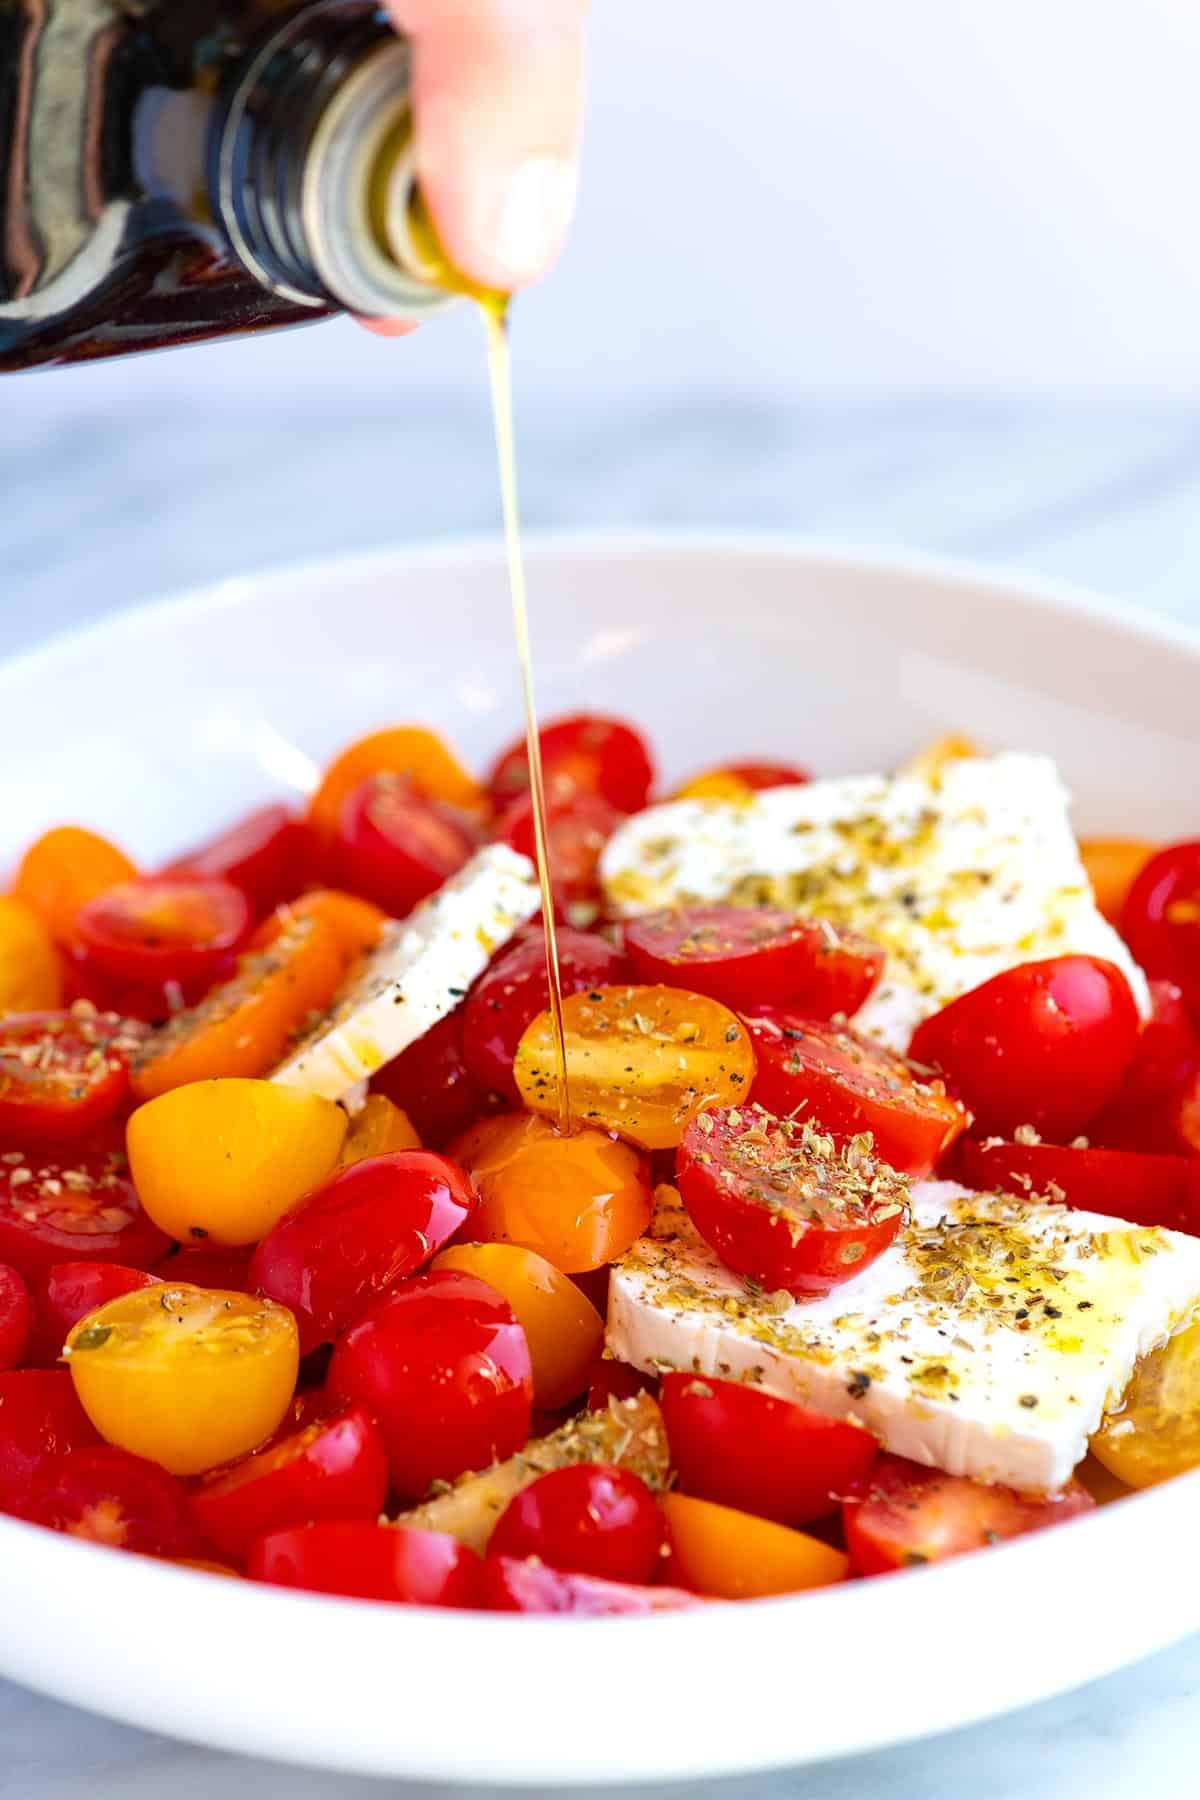 Easy Cherry Tomato and Feta Salad